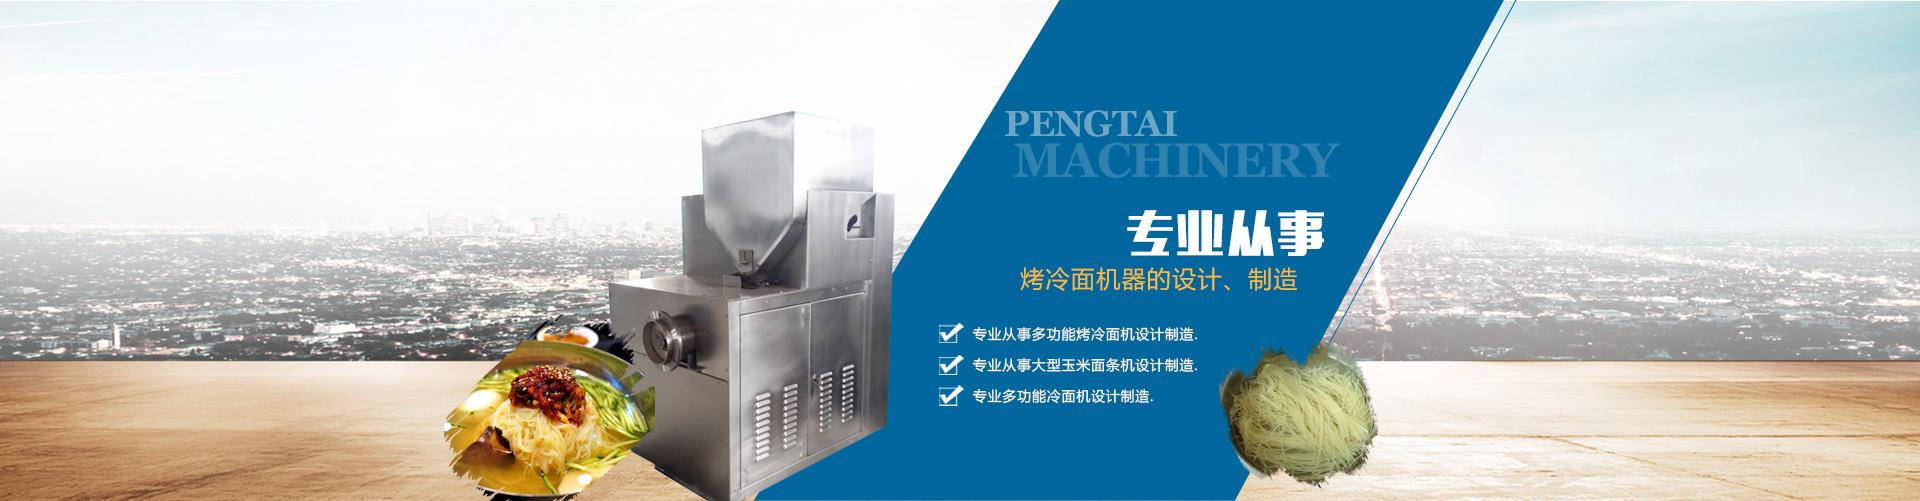 烤冷面机器